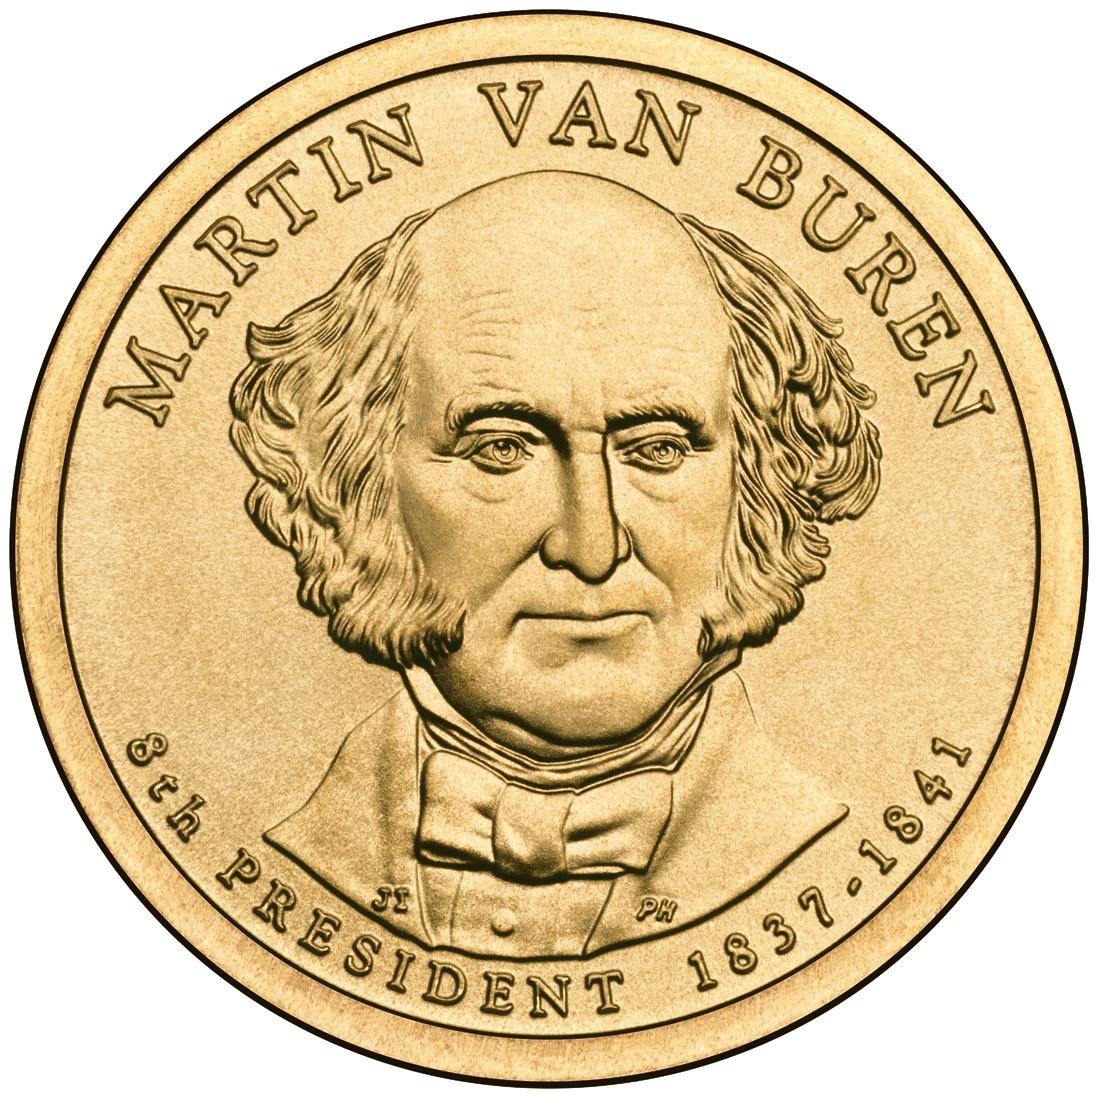 filemartin van buren presidential 1 coin obversejpg